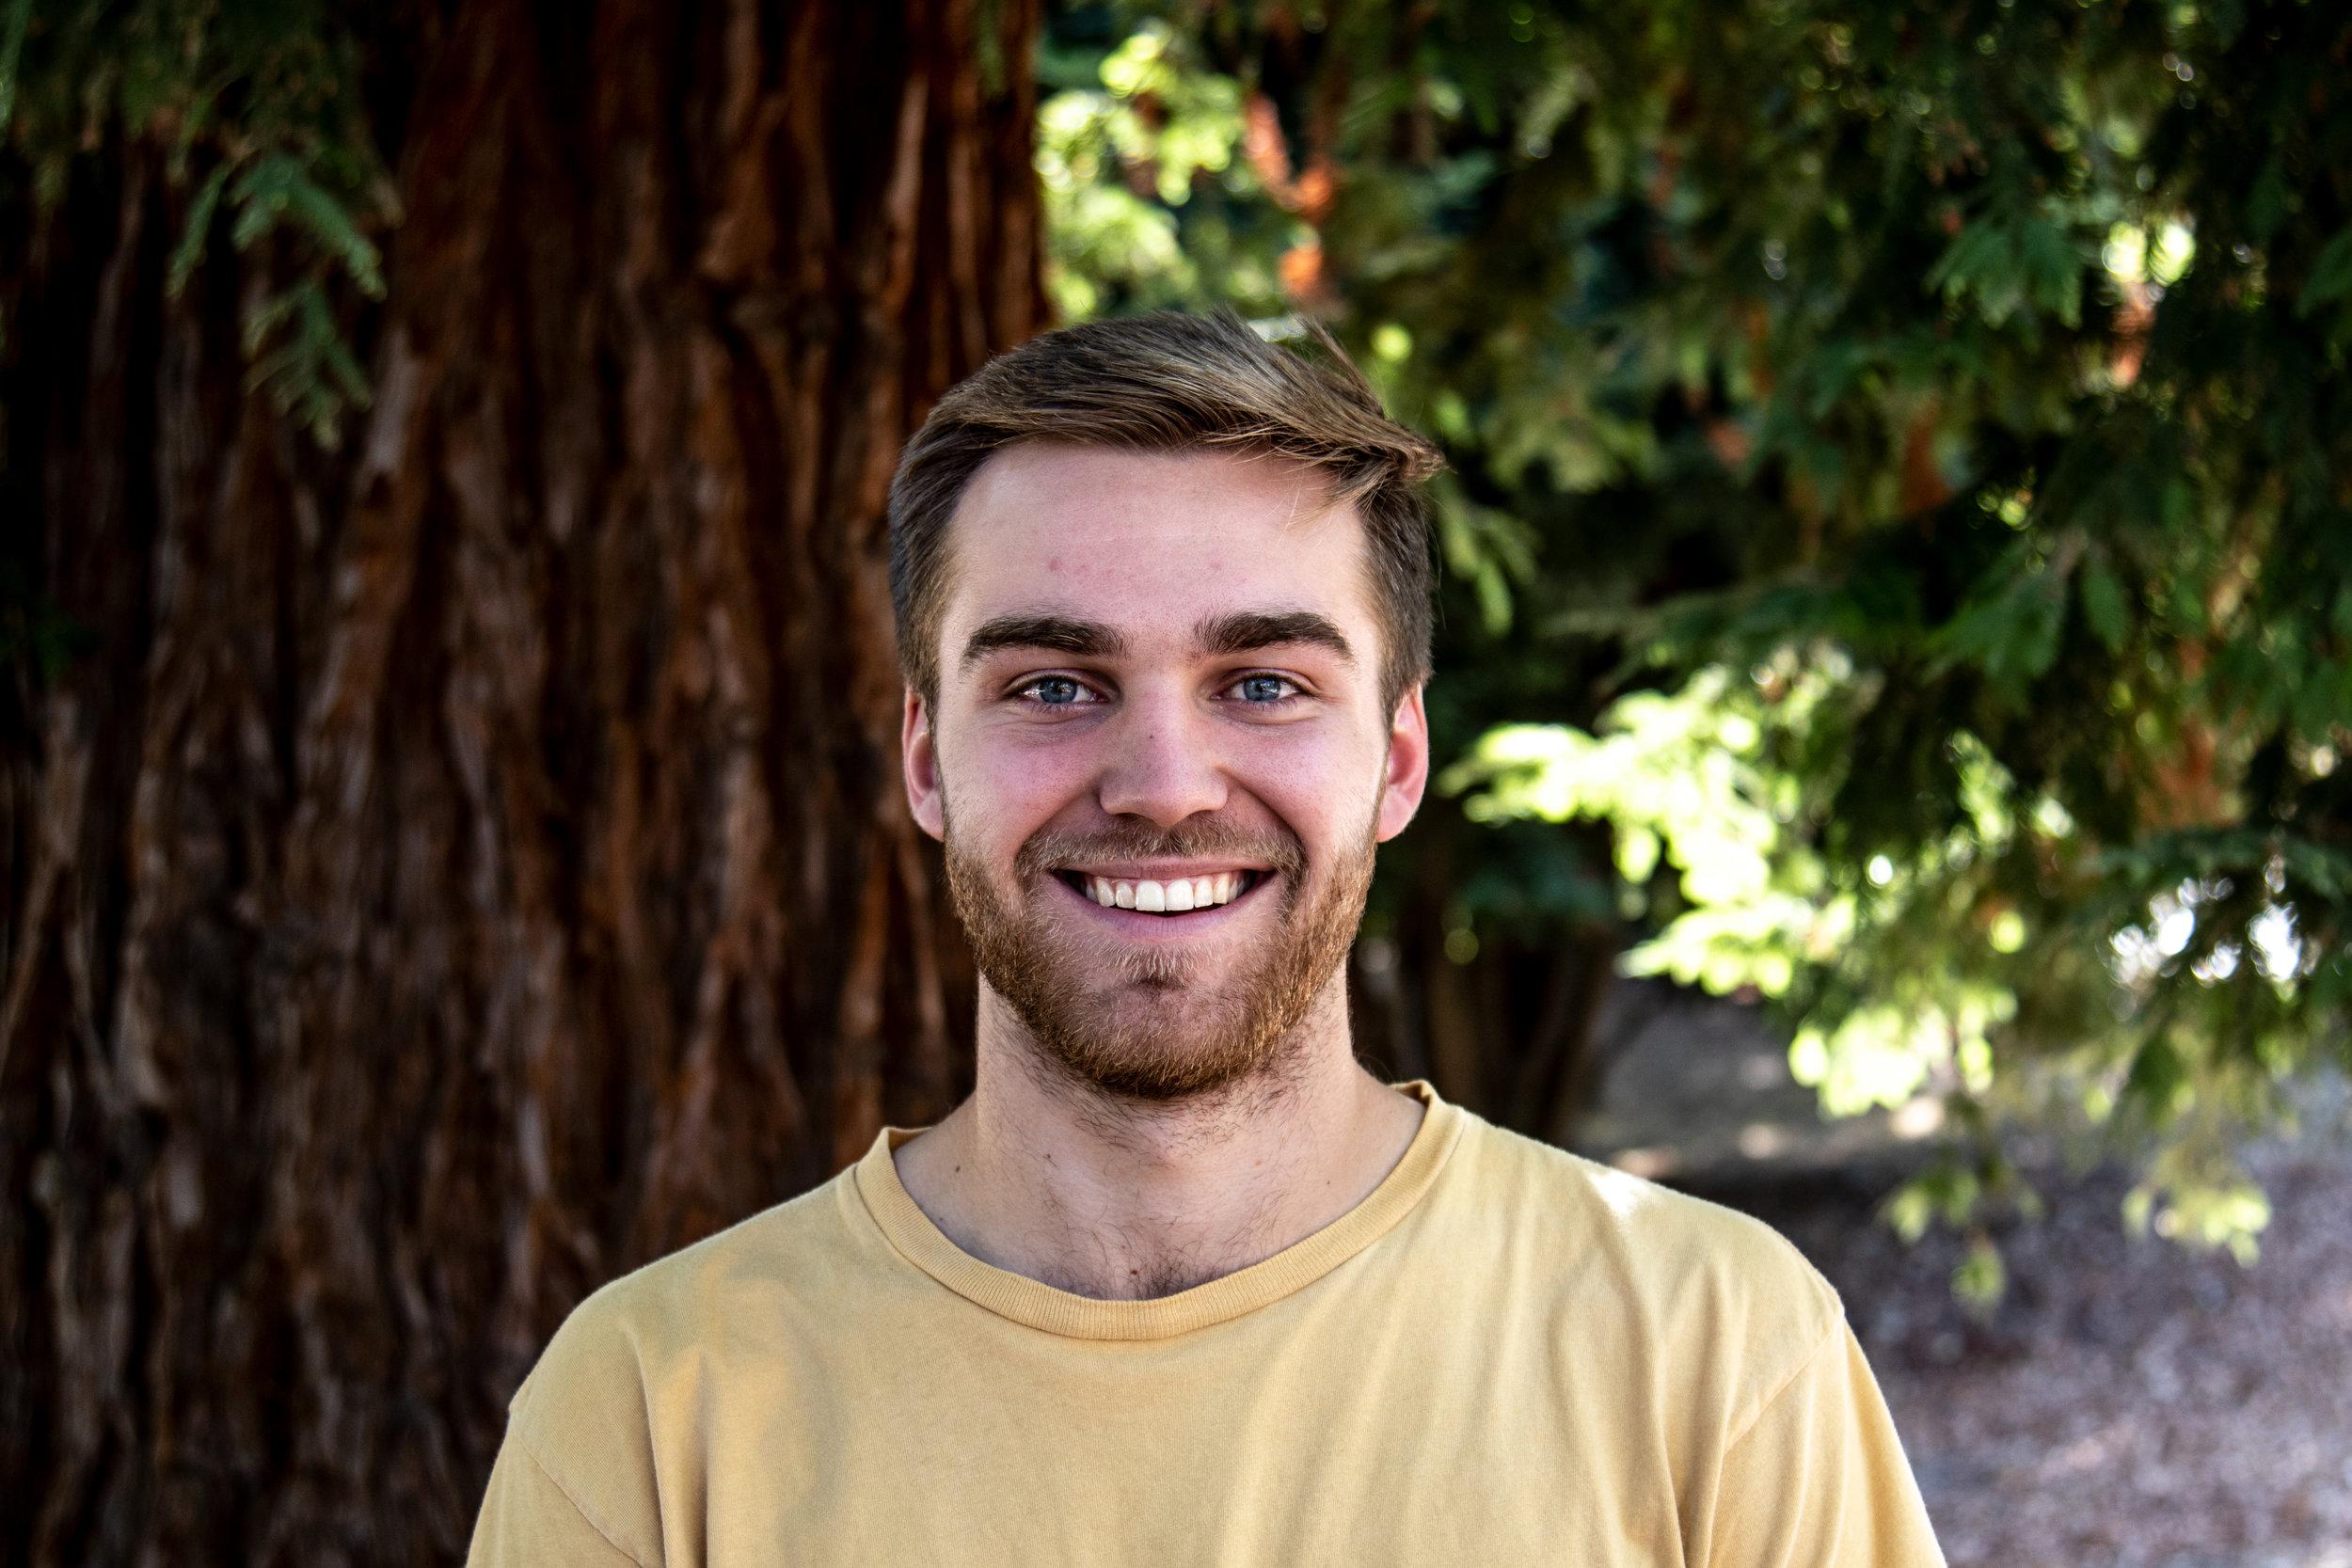 Daniel bigelow - Director of Student Ministries